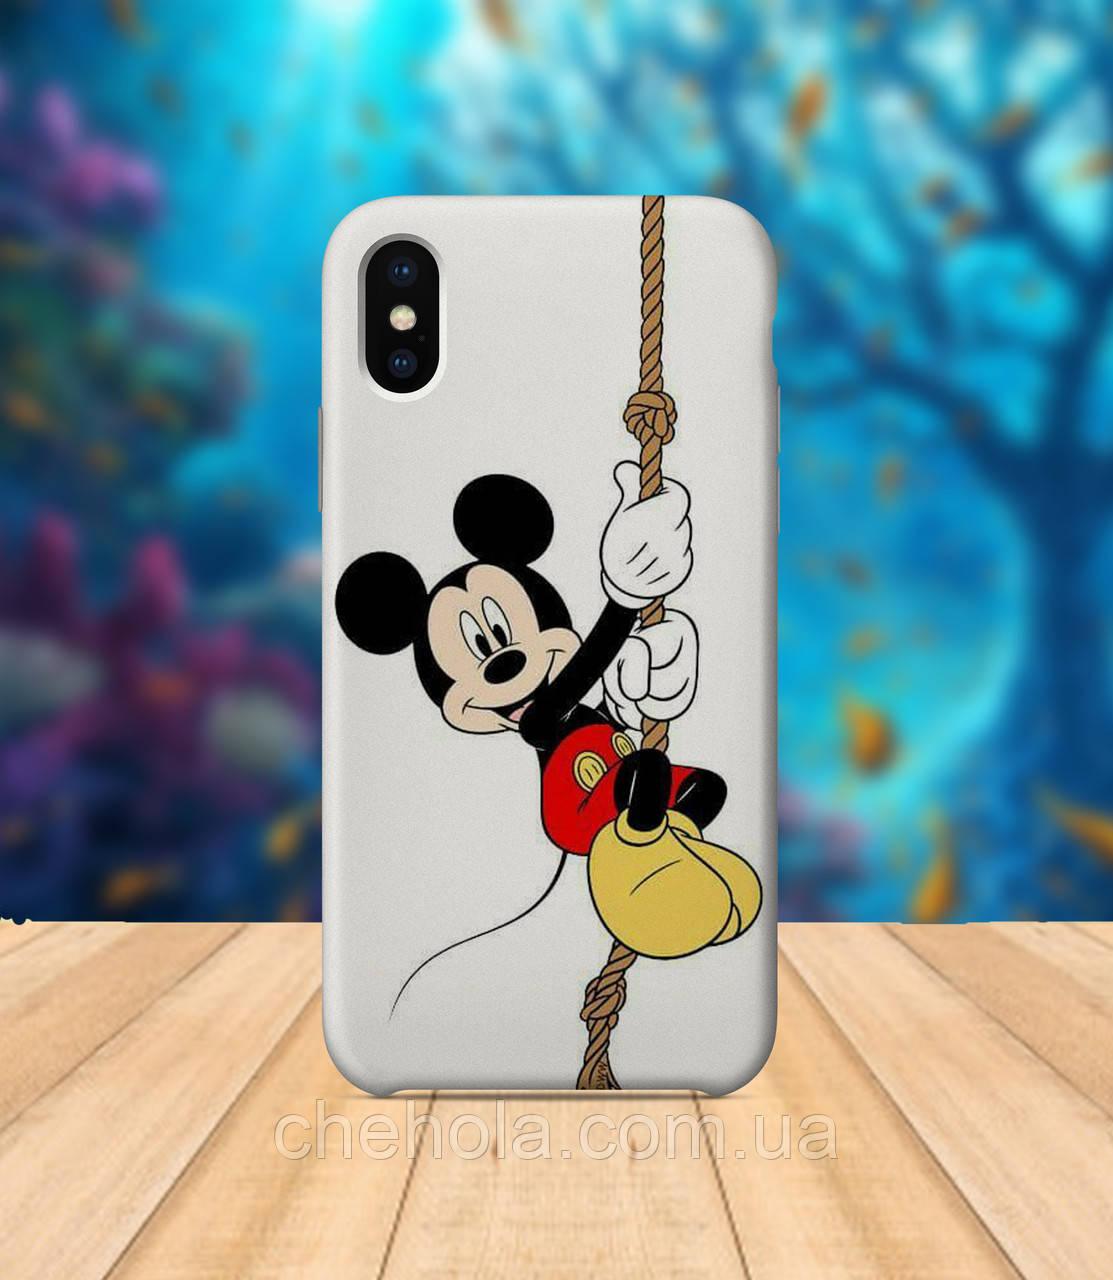 Чехол для apple iphone x XS max Микки Маус чехол с принтом